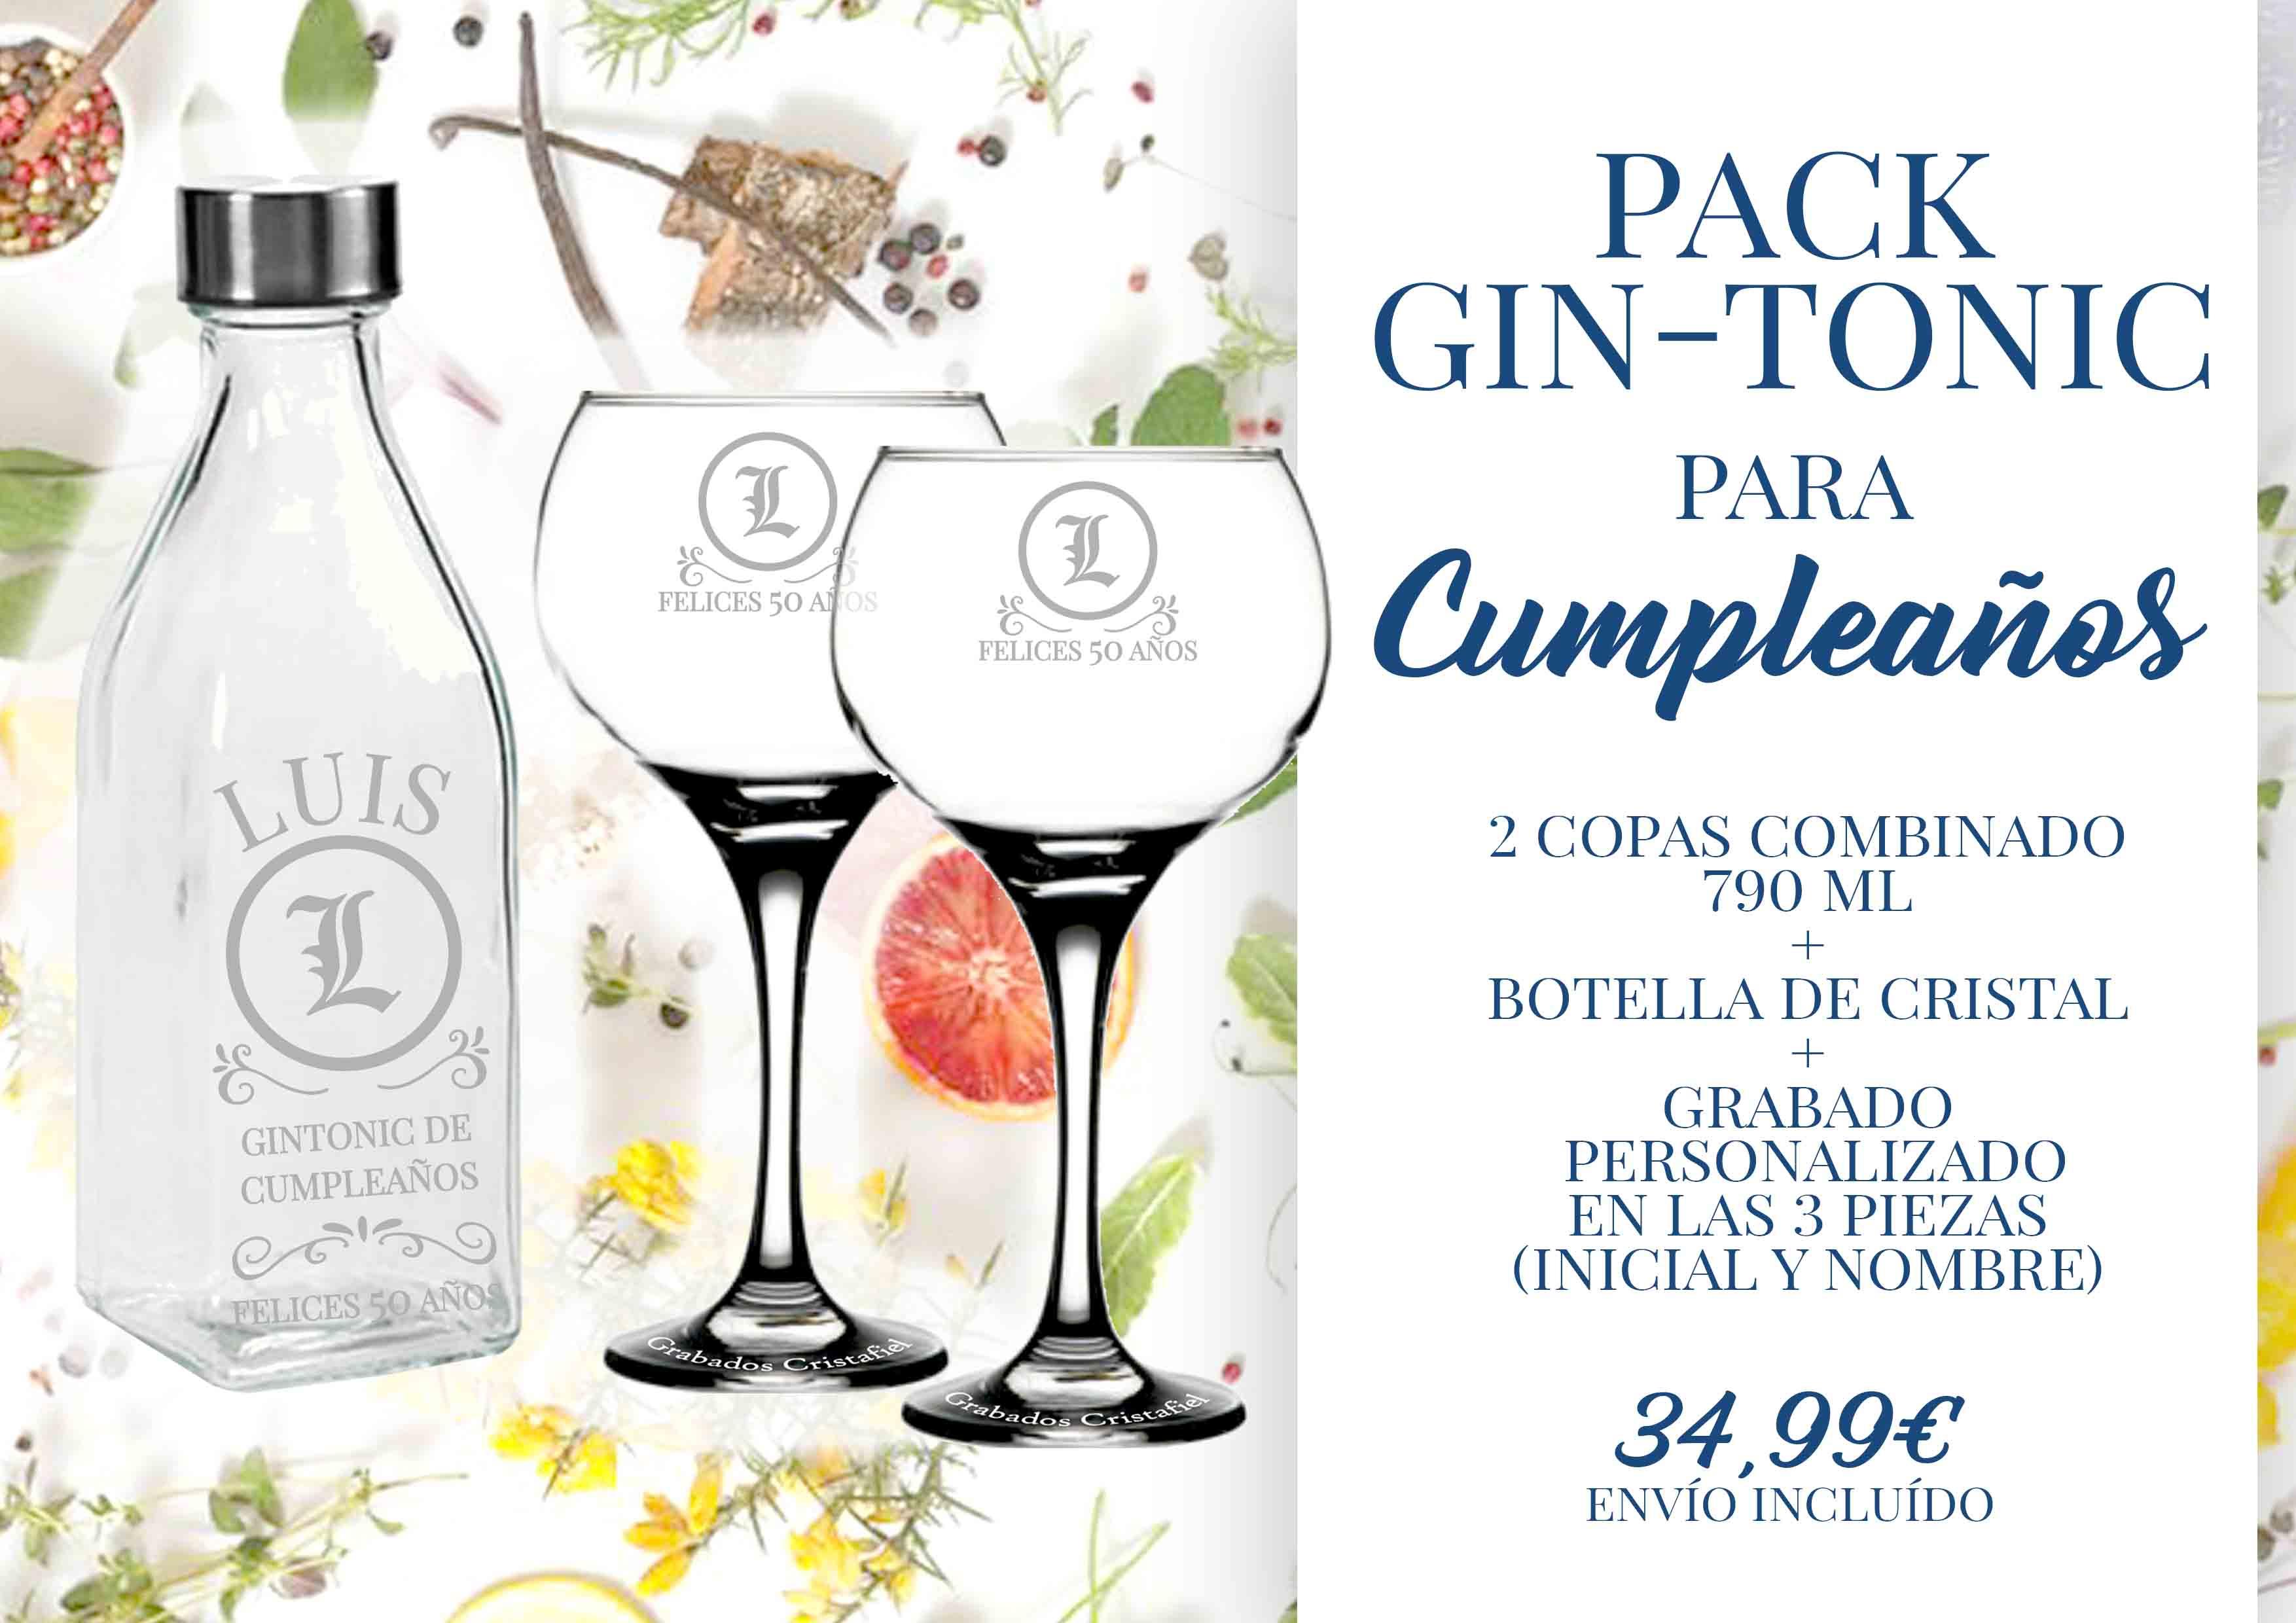 Gin Tonic Cumpleaños Grabados Cristafiel